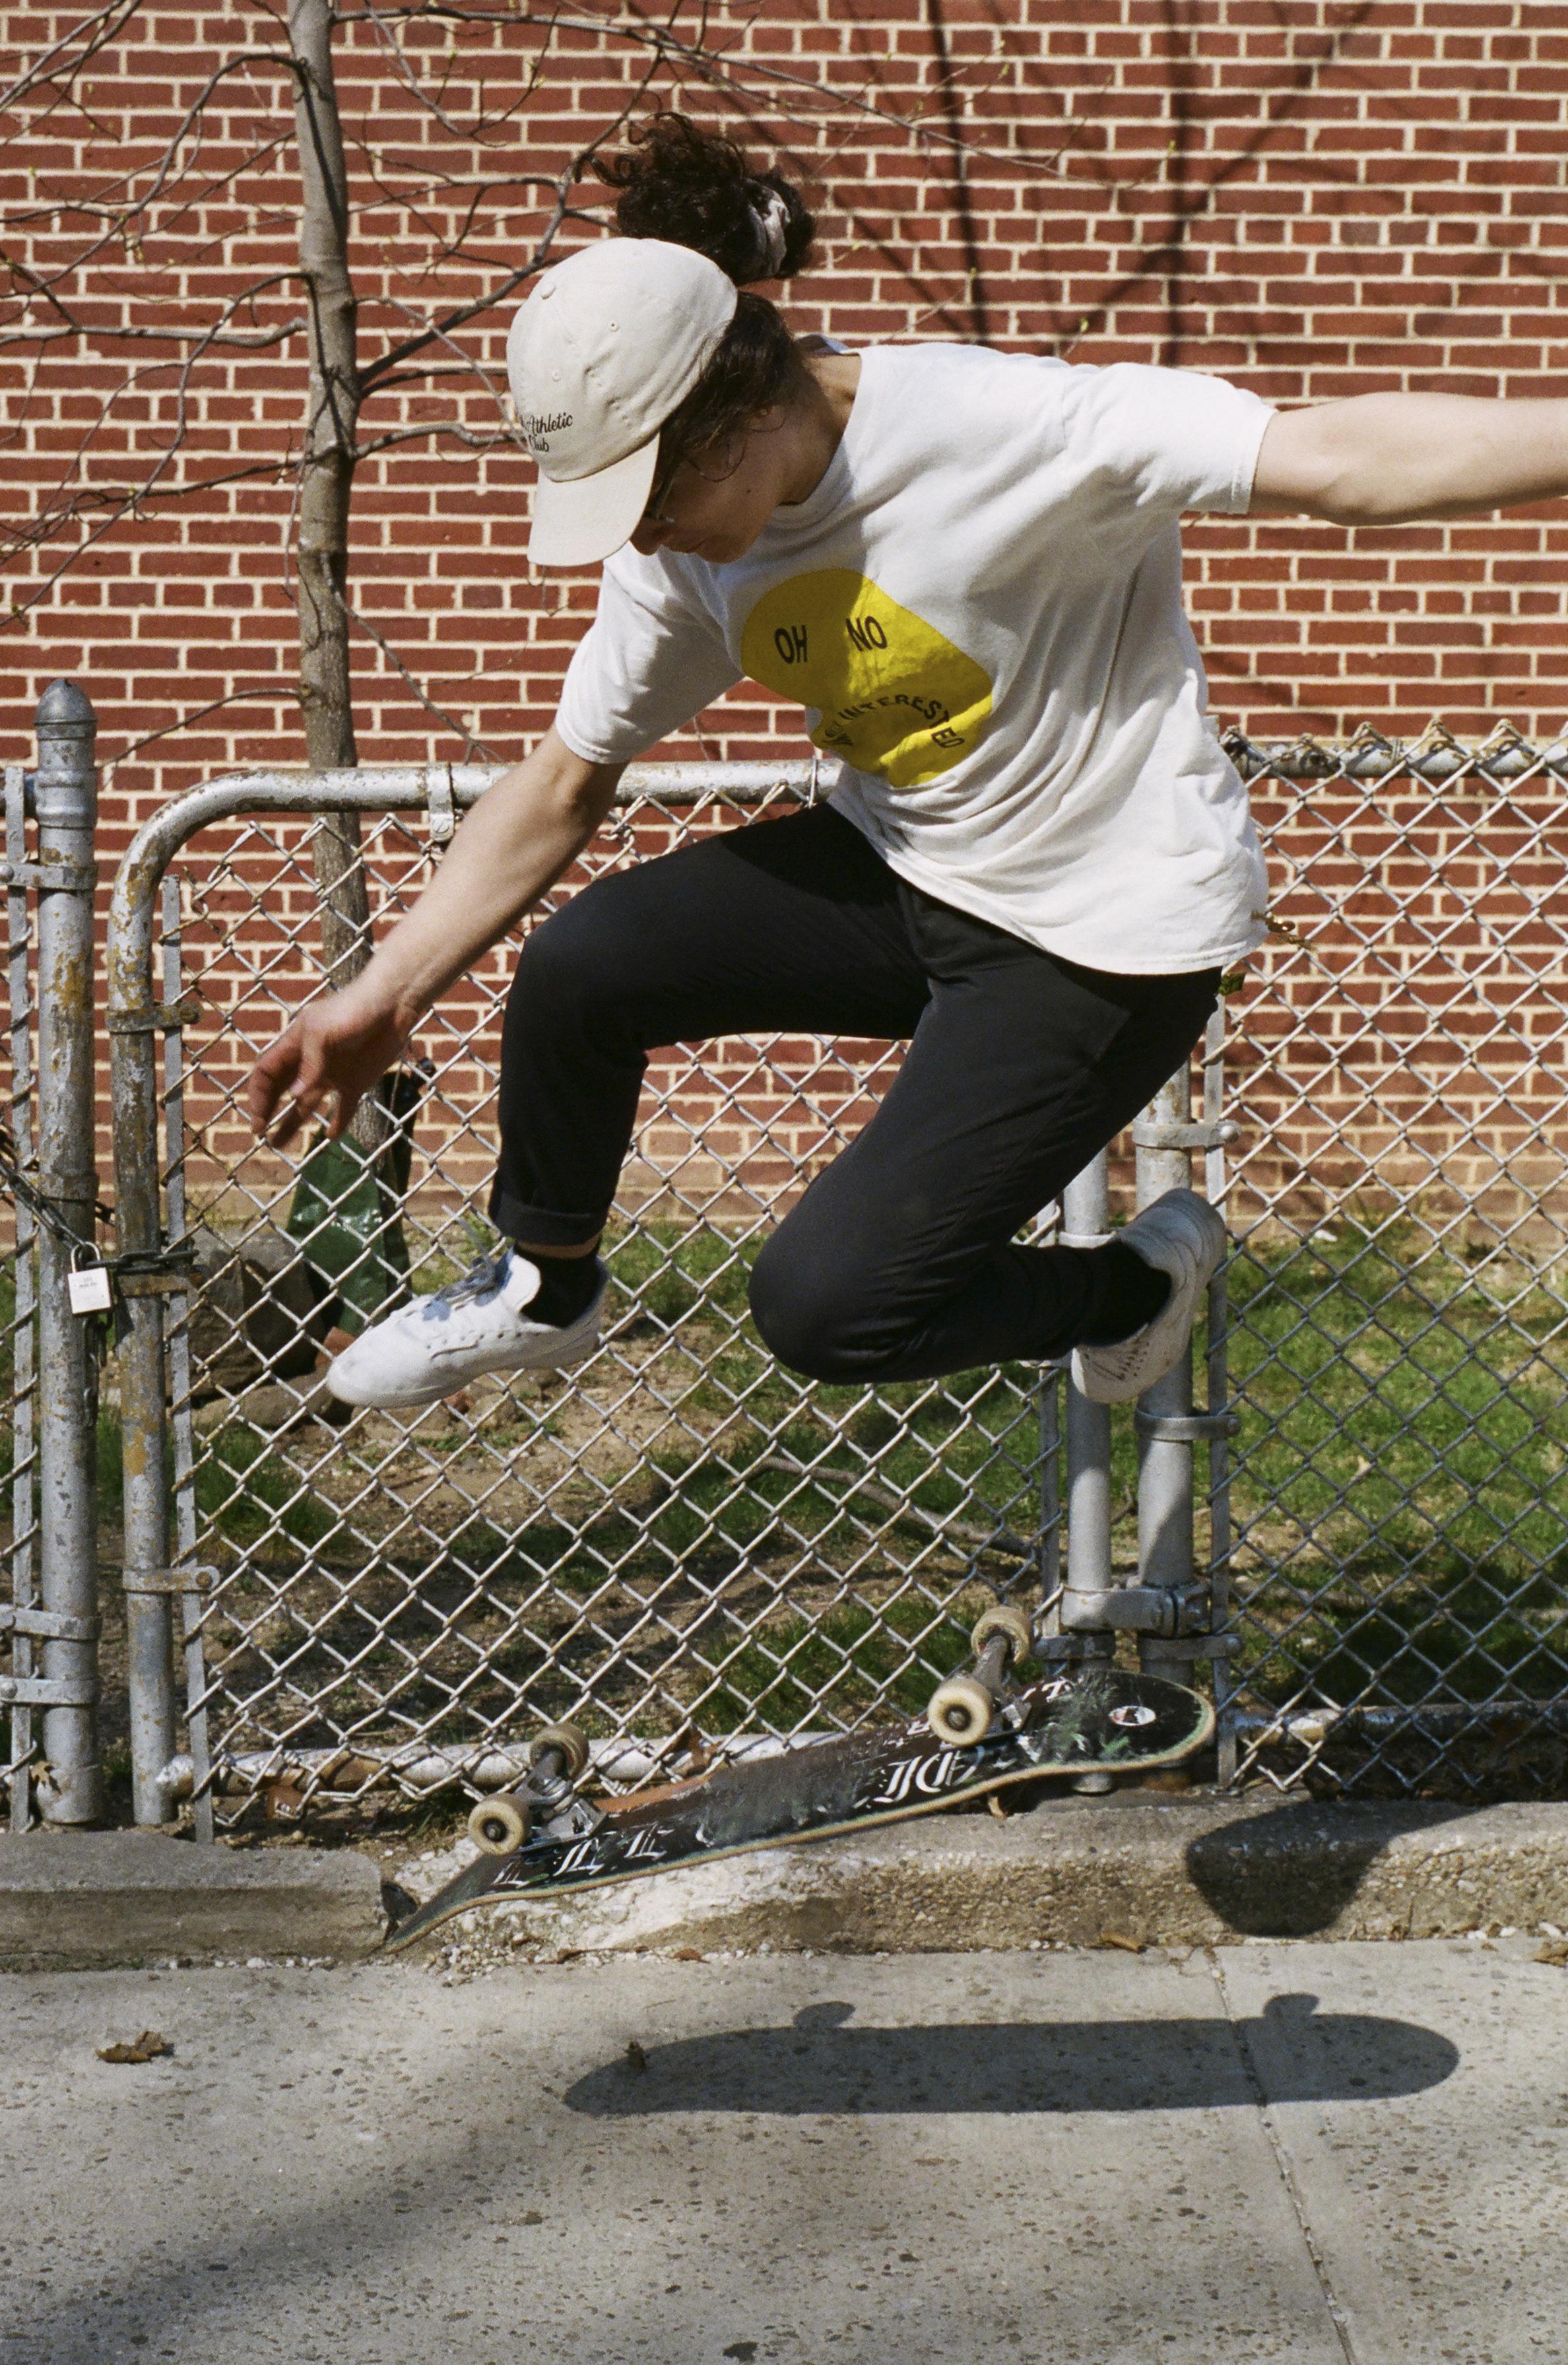 sesso Skateboards progetta